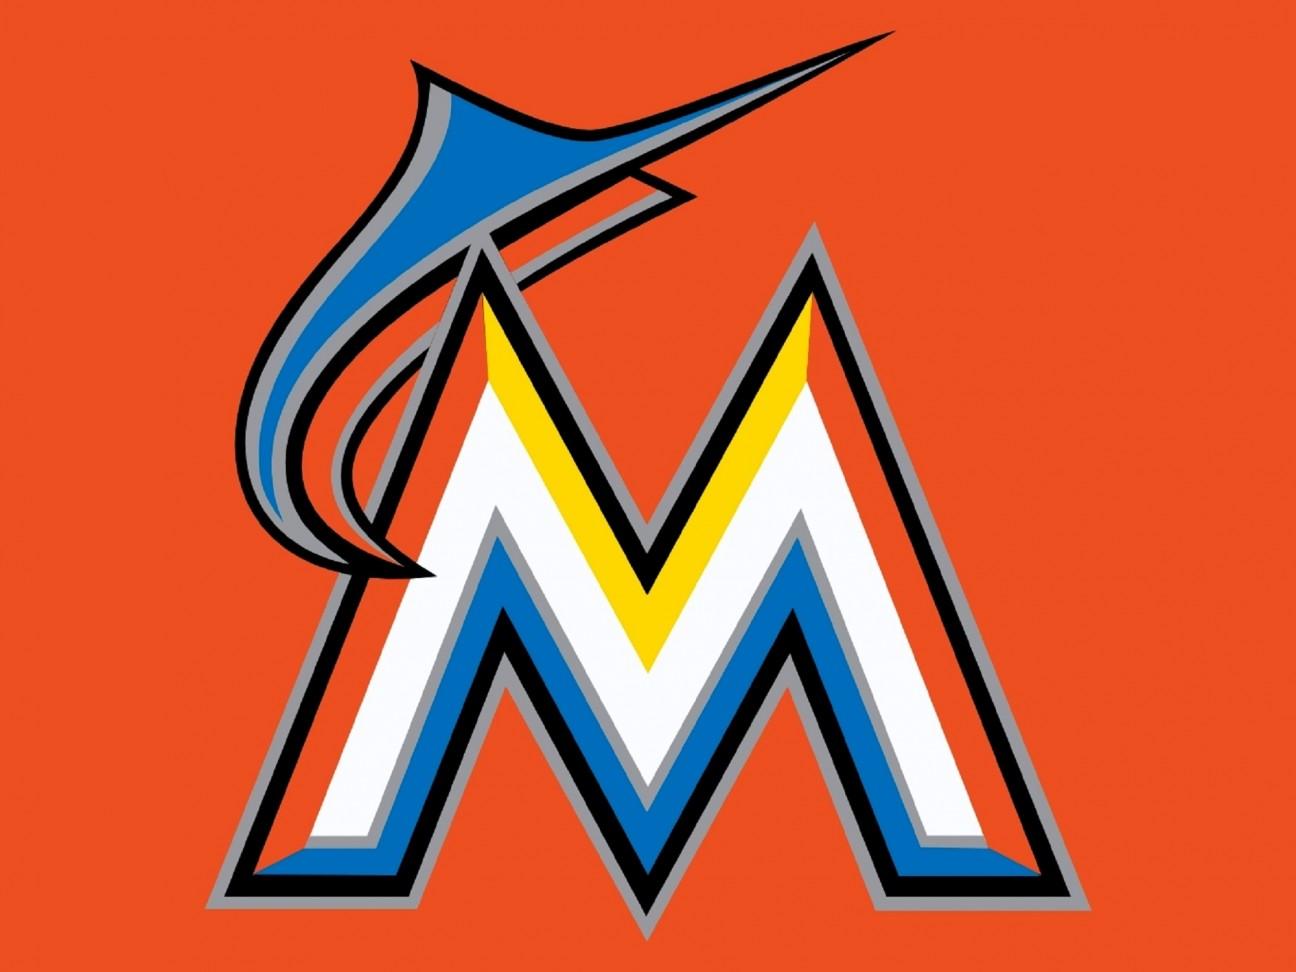 miami marlins logo secret message, secret messages in sports logos, logo conspiracies